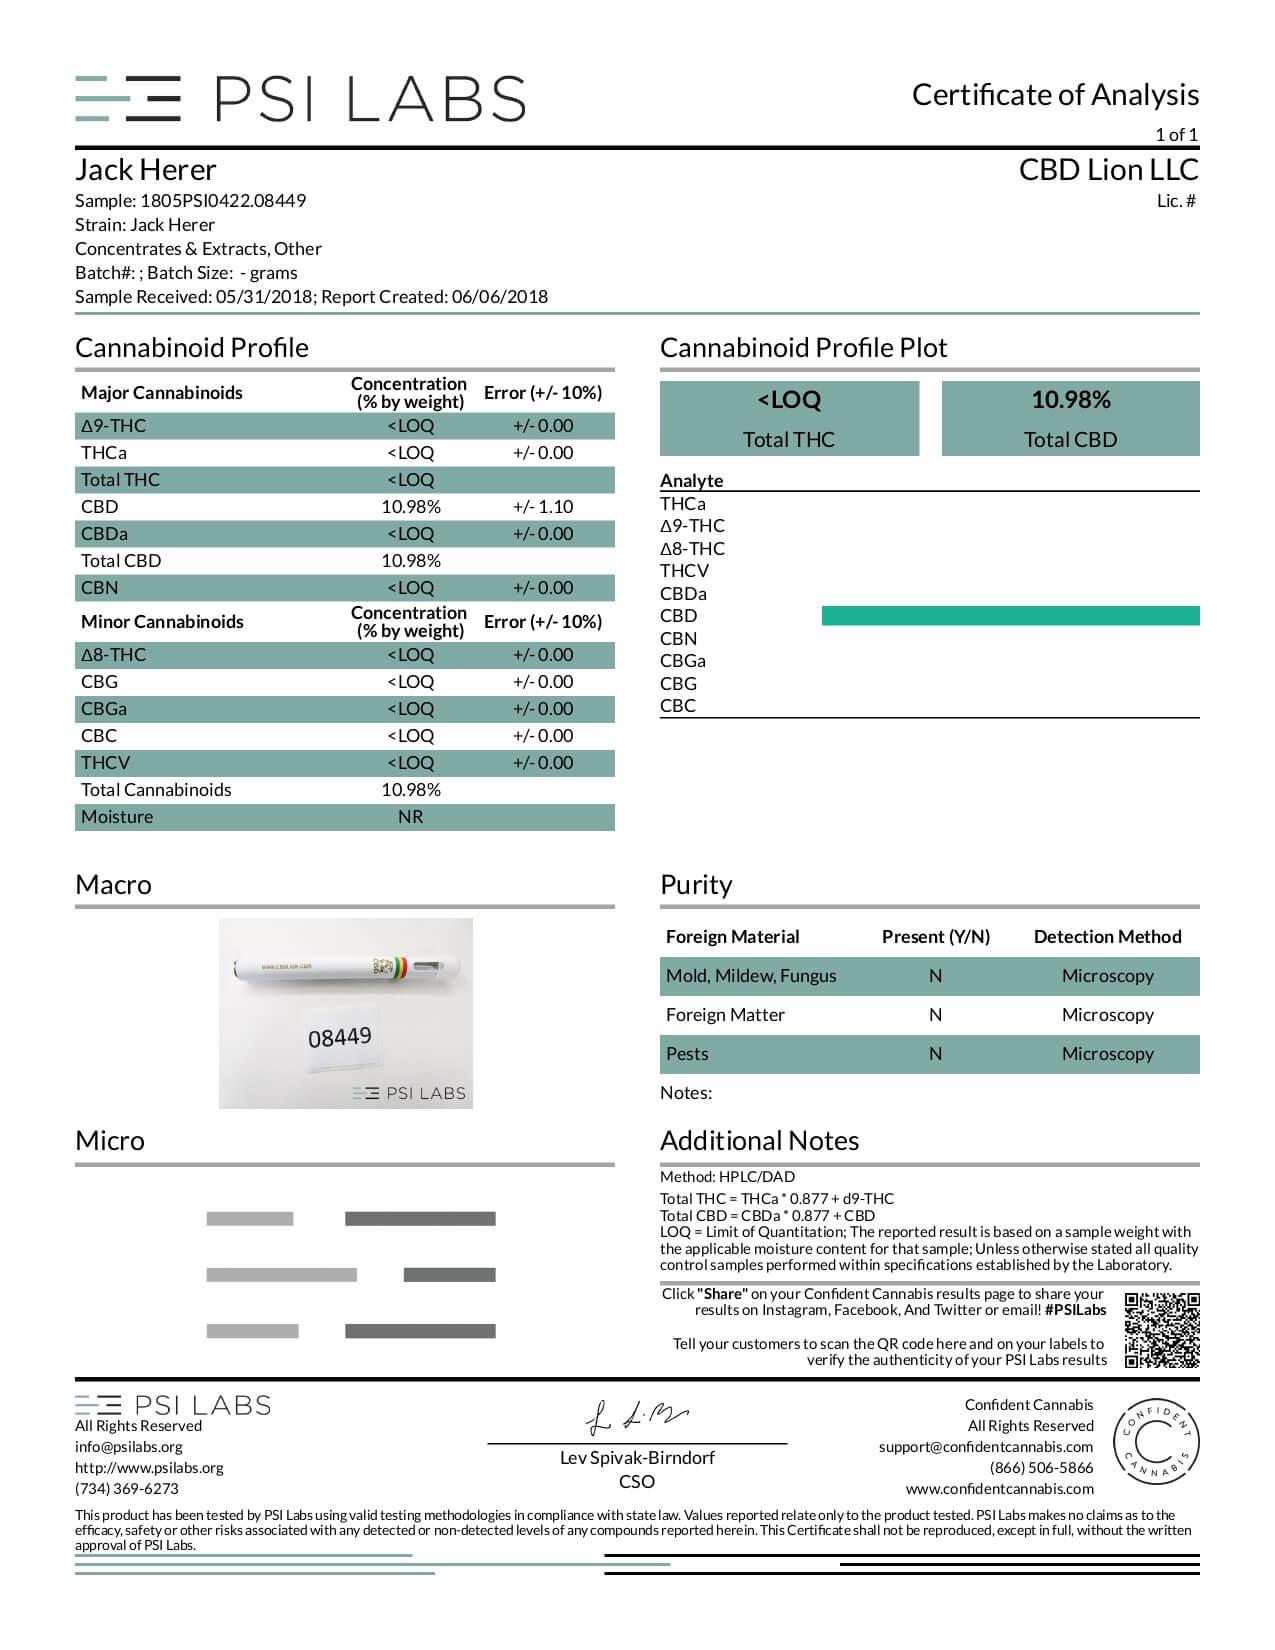 CBD Lion CBD Disposable Vape Pen Jack Herer Lab Report